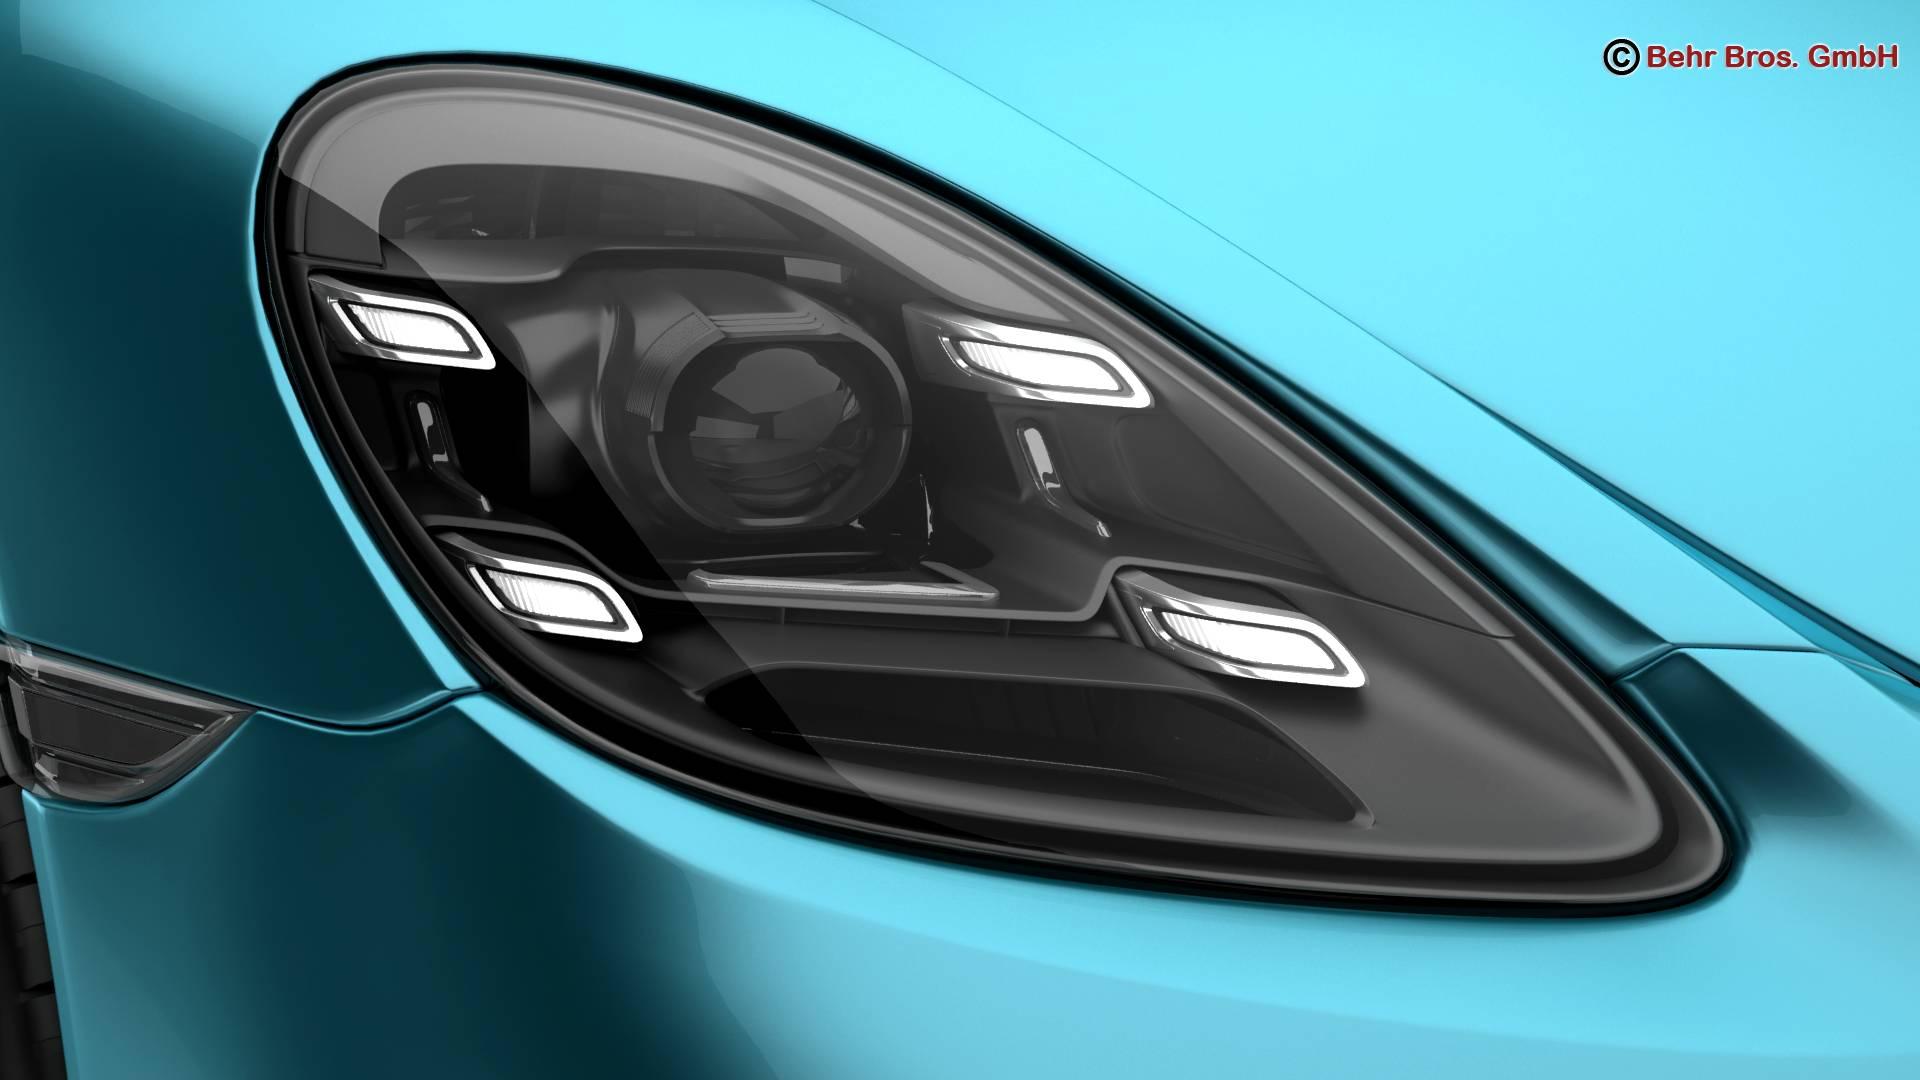 porsche 718 cayman s 2017 3d model 3ds max fbx c4d lwo ma mb obj 220111